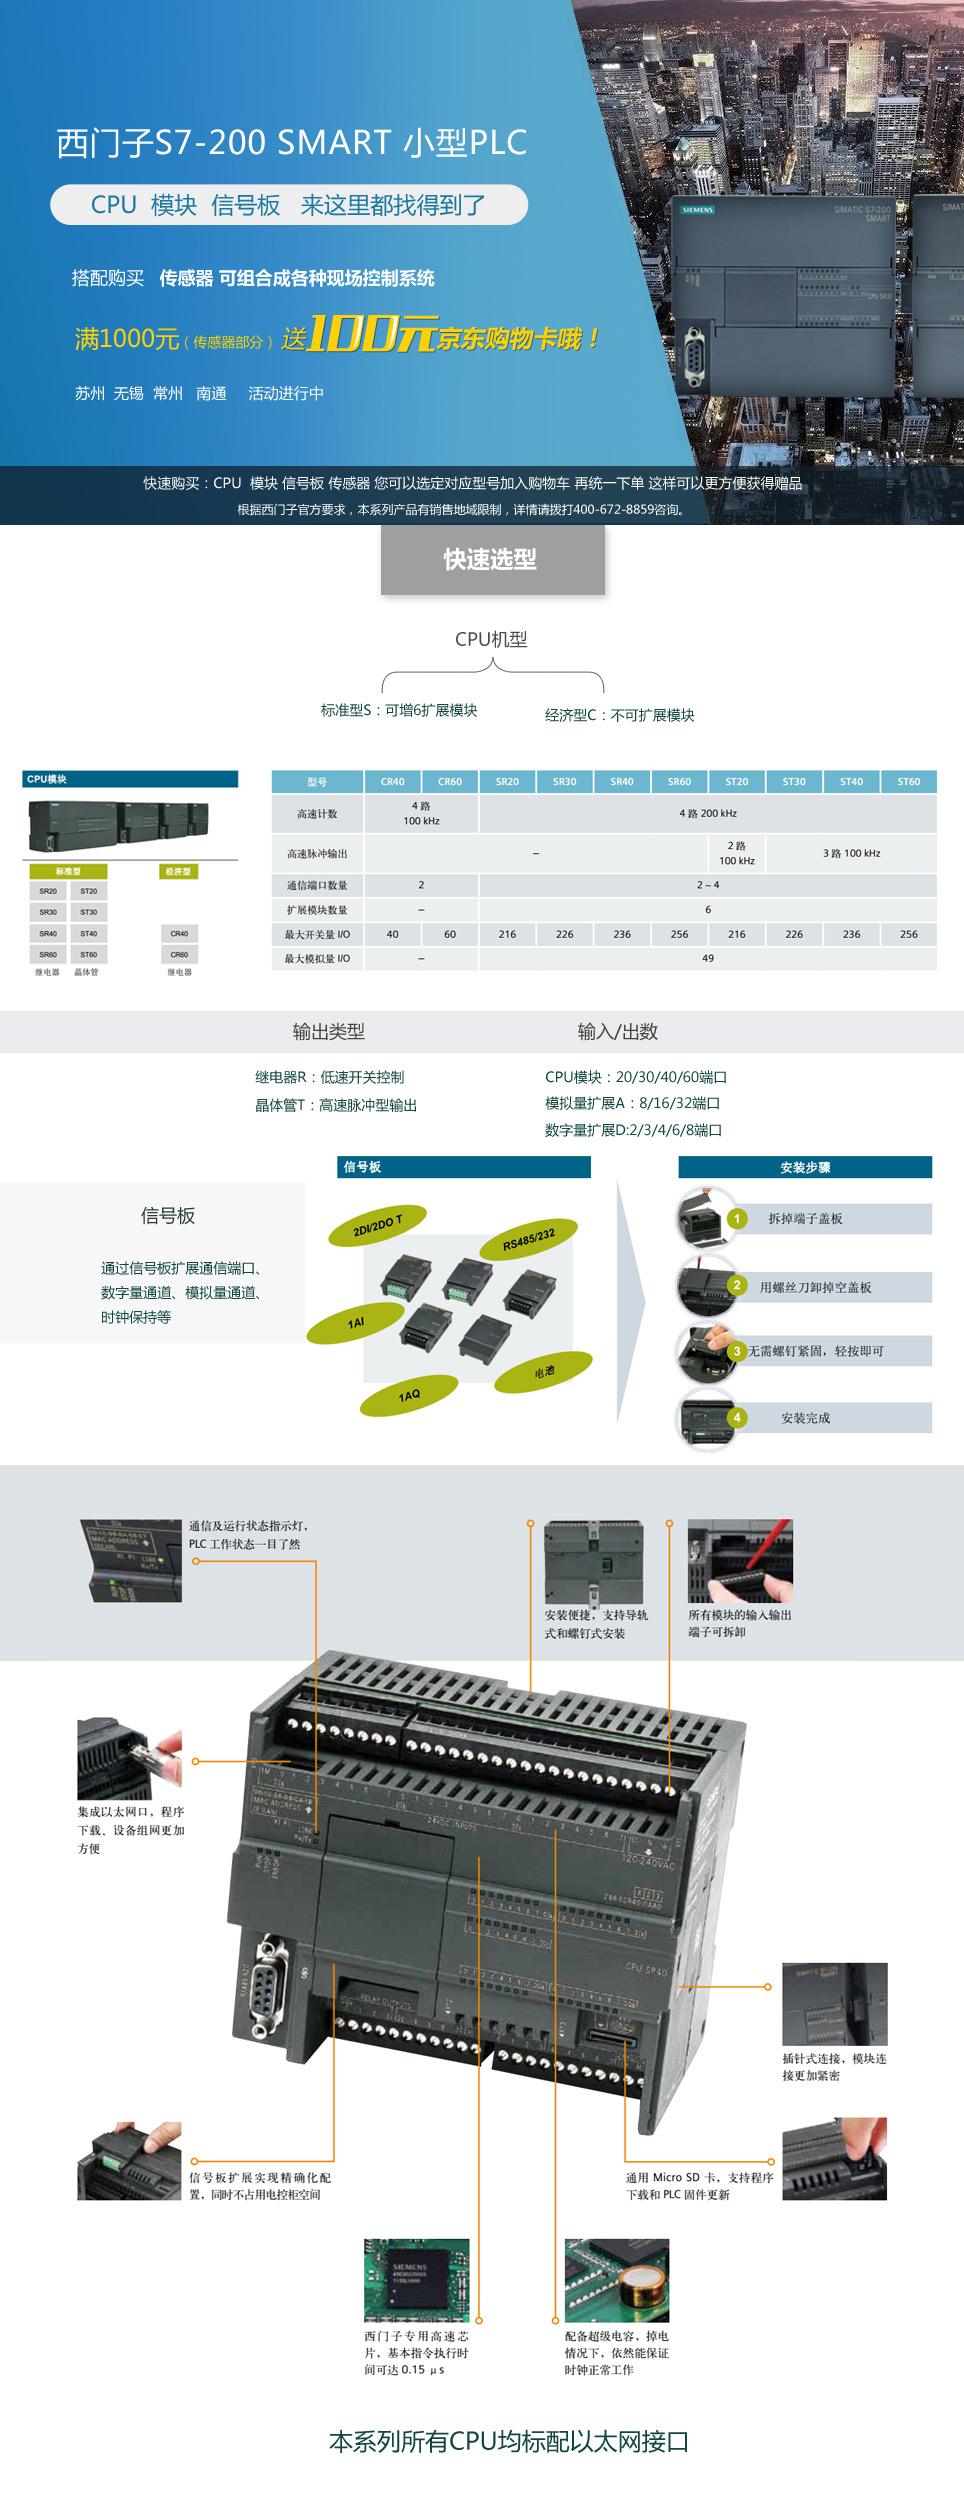 S7-200SMART专题-2_03.jpg